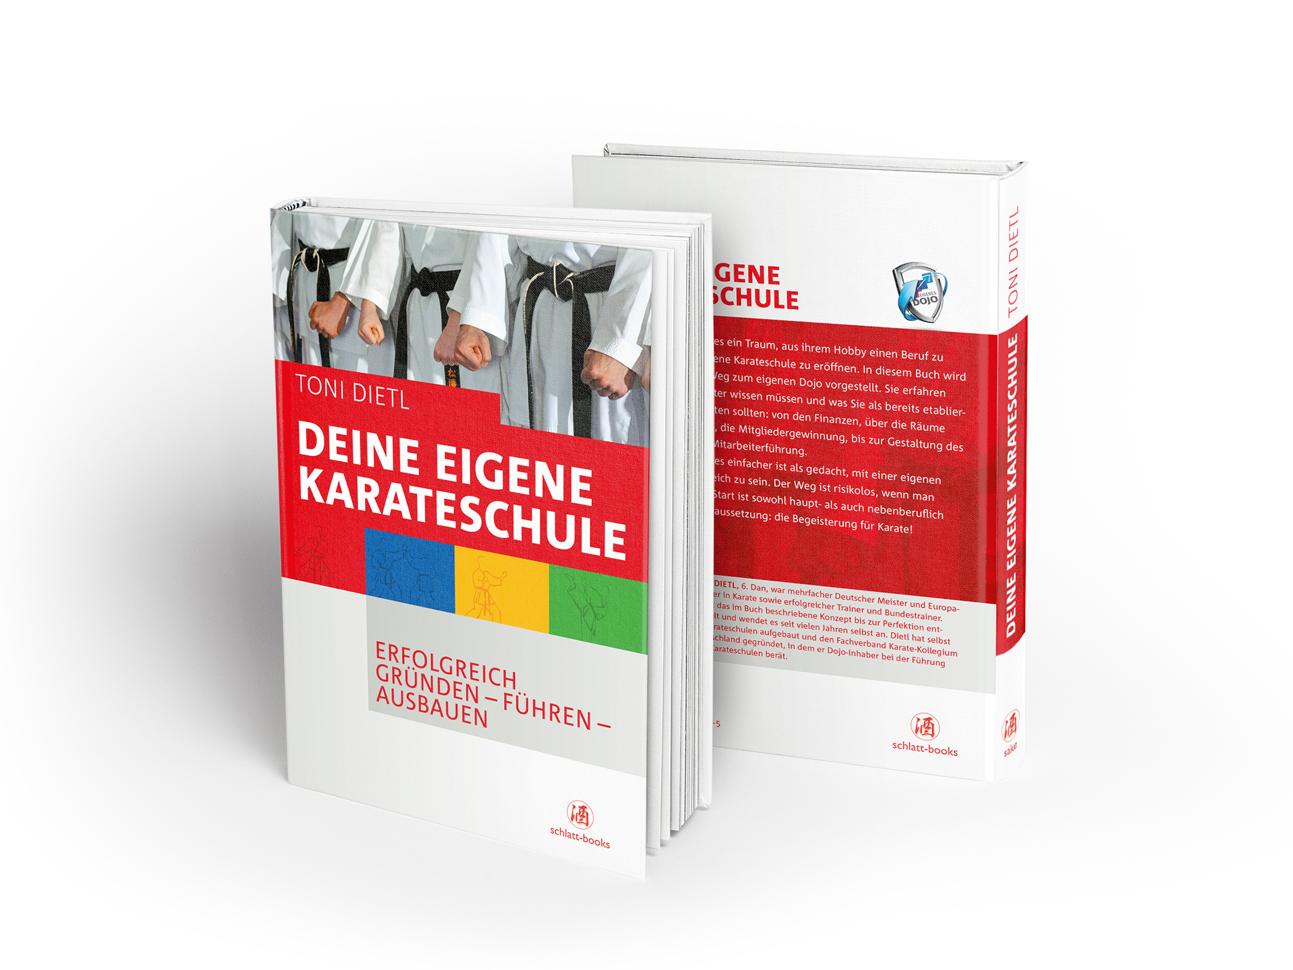 martin_zech_design_buchcover_toni_dietl_deine_eigene_karateschule